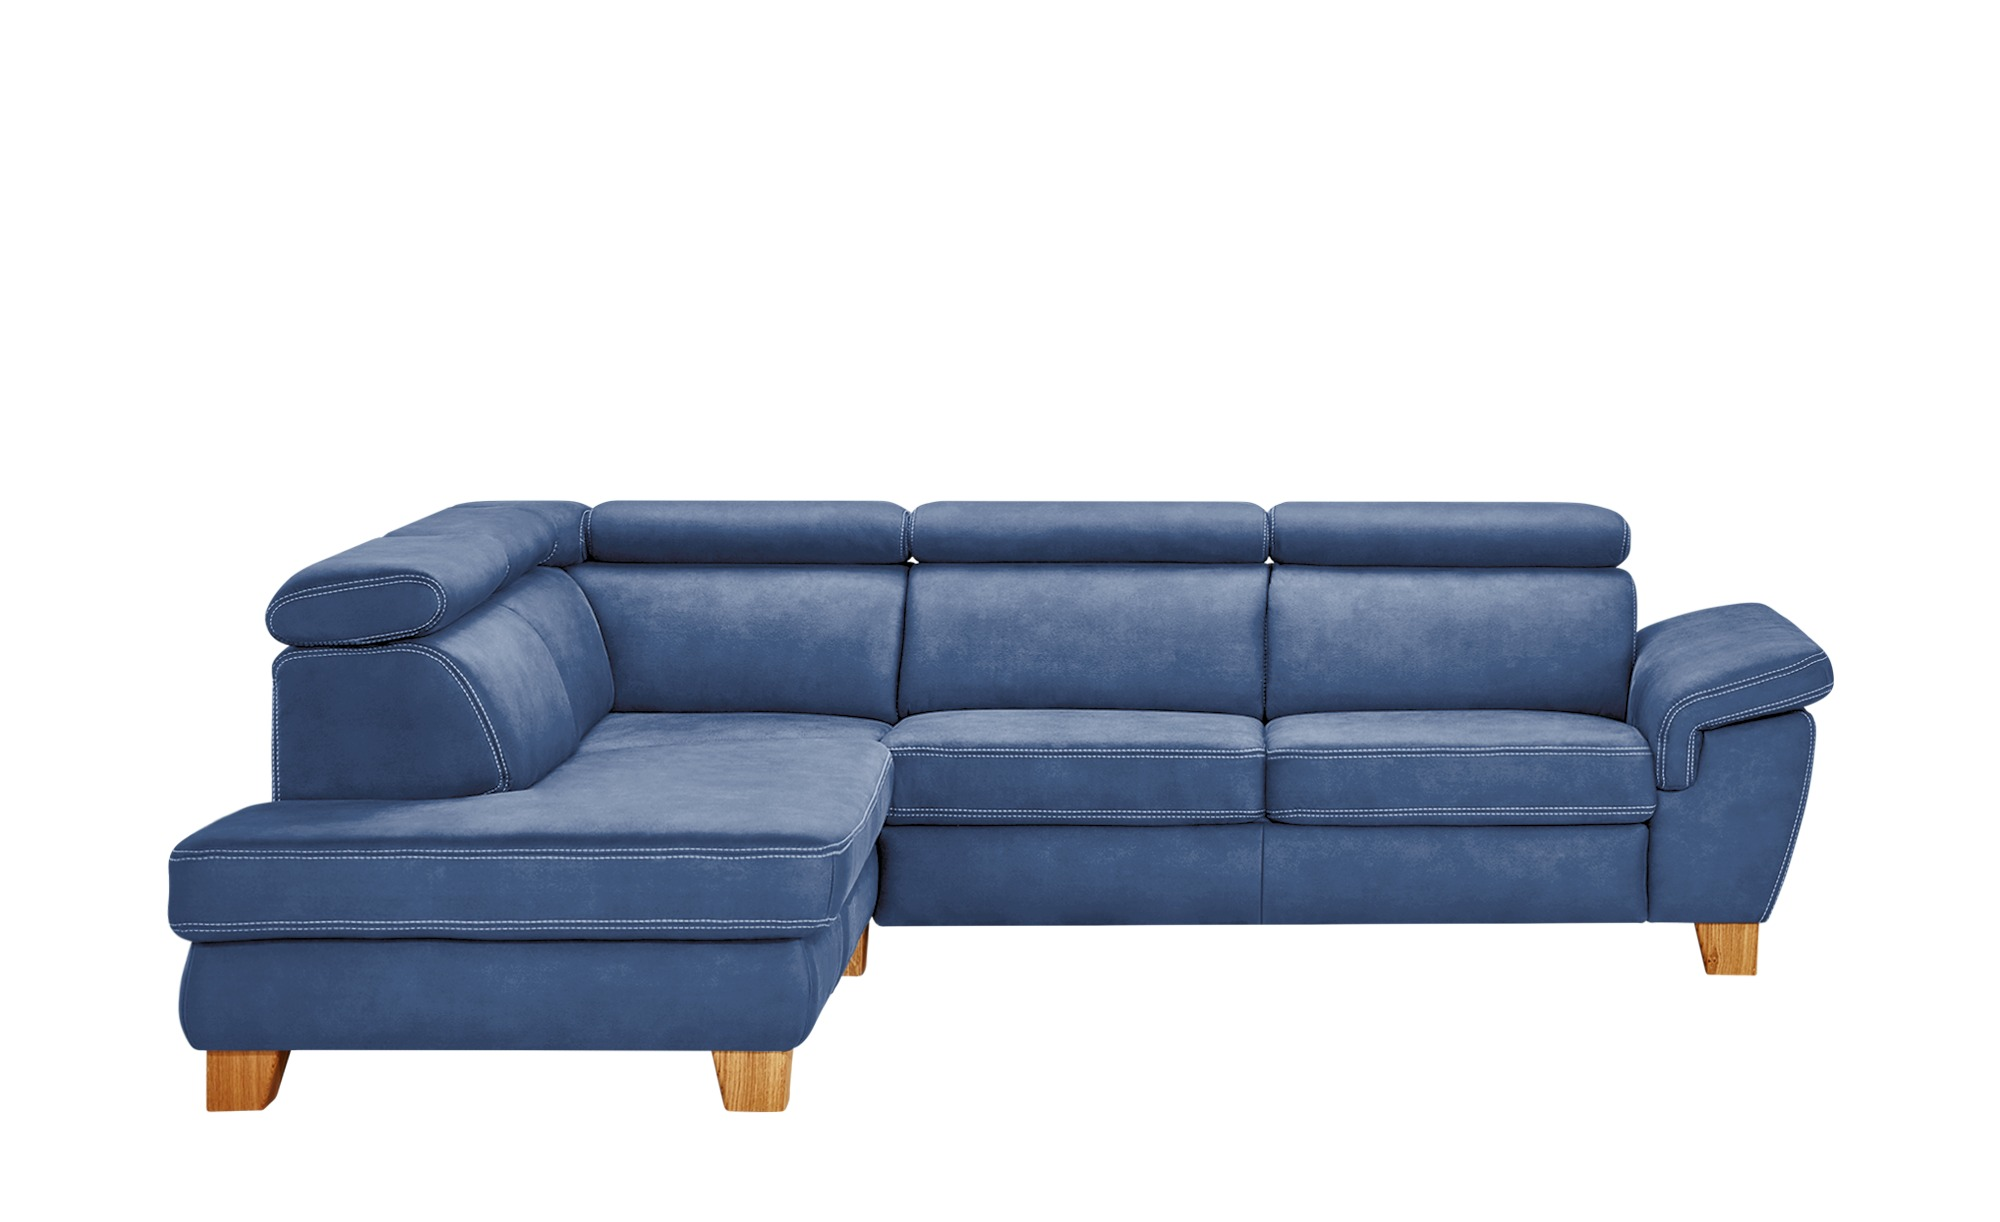 Klippan Sofa Leder Rot Design Sofa Cushion Covers Schoner Wohnen Sofa Grau Sofas Designer Schlafsofa Federkern Neckermann Ecksofa Sofa Ecksofas